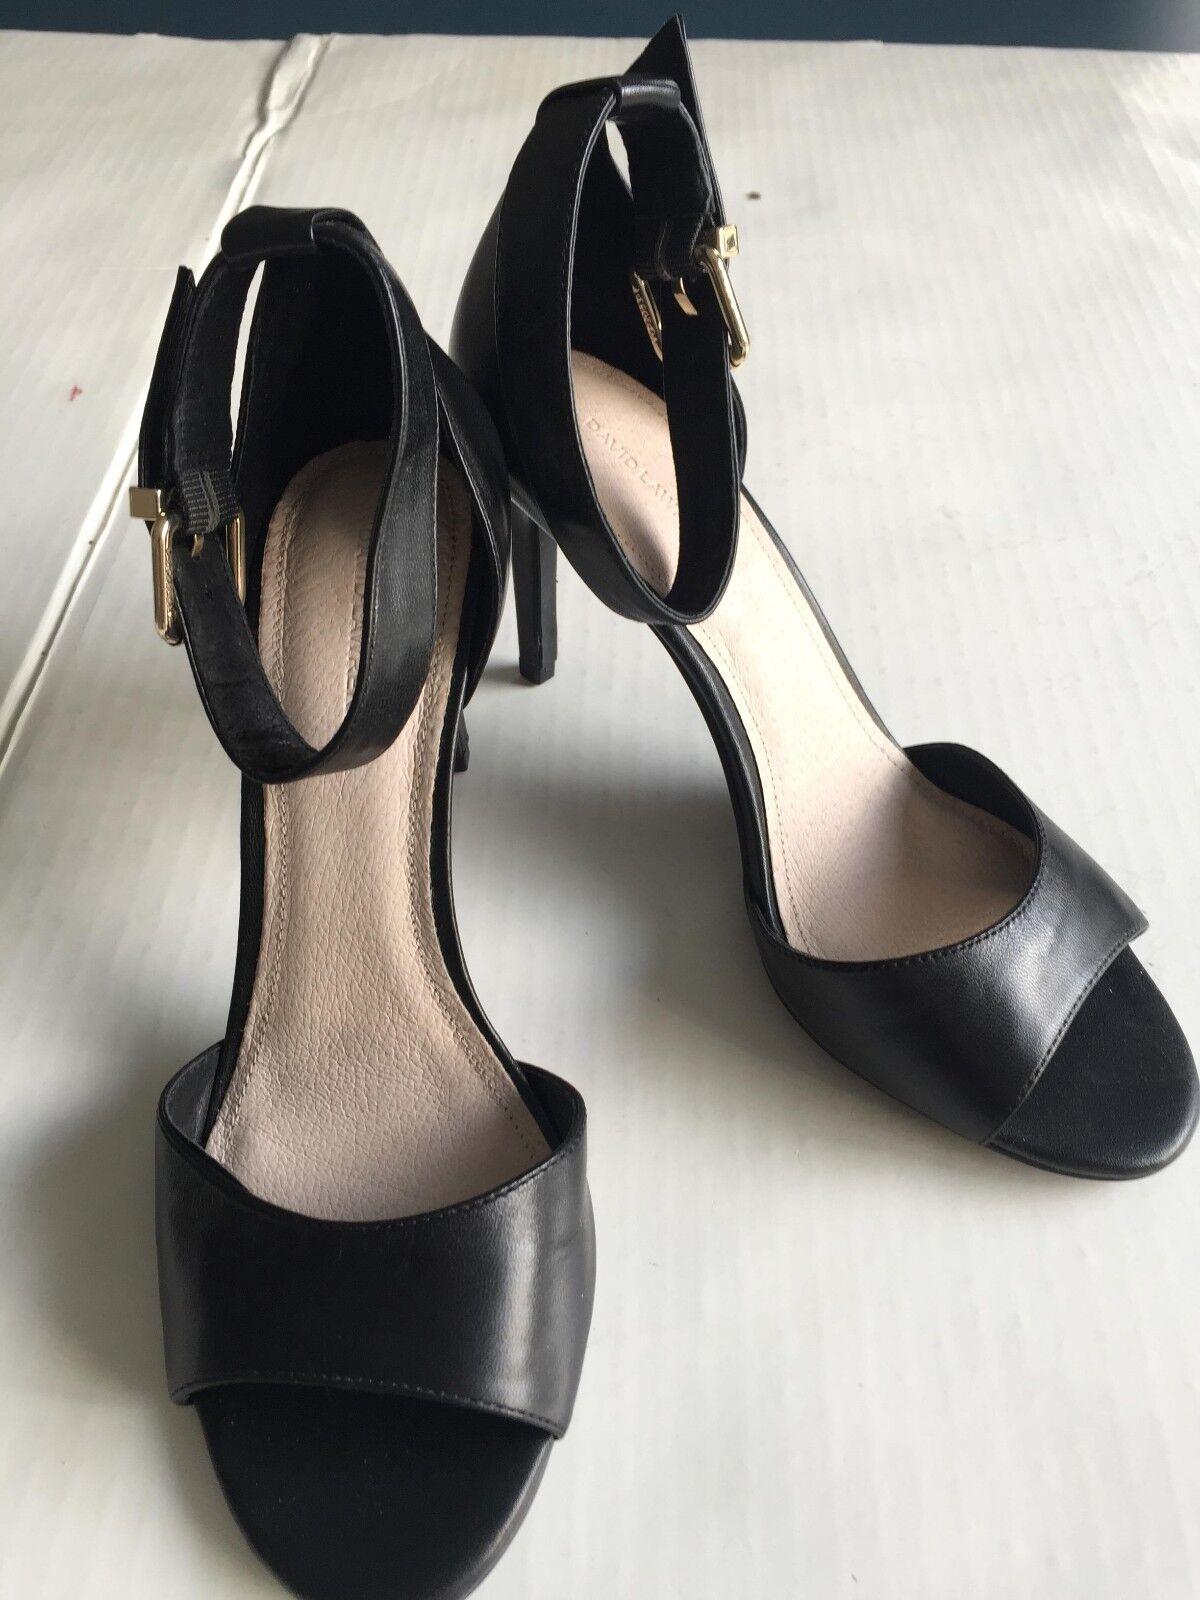 David Lawrence Luana Peeptoe Heel - Brand New - Size 38 - Leather shoes